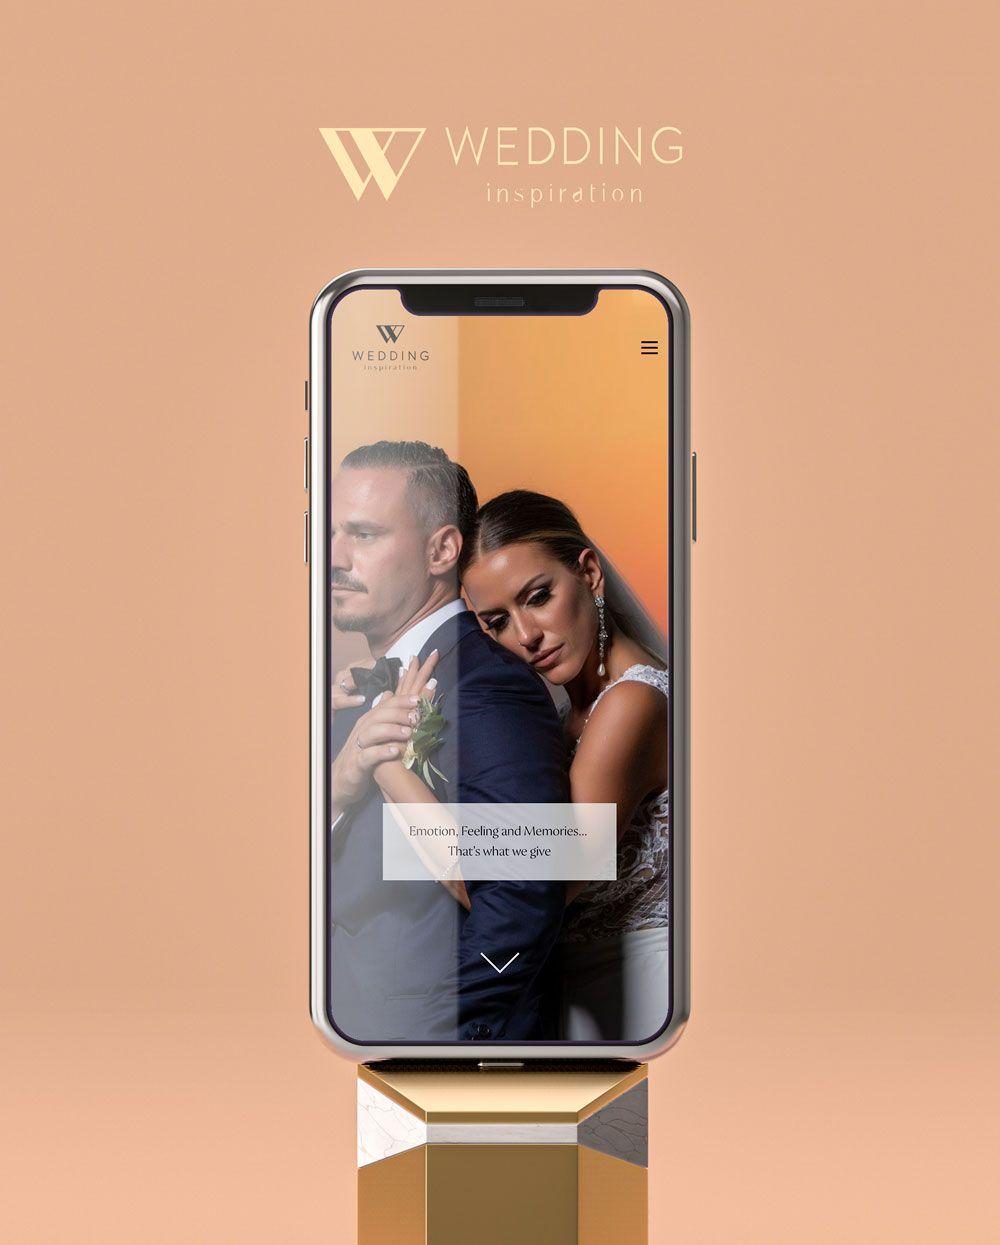 13 Wedding Inspiration